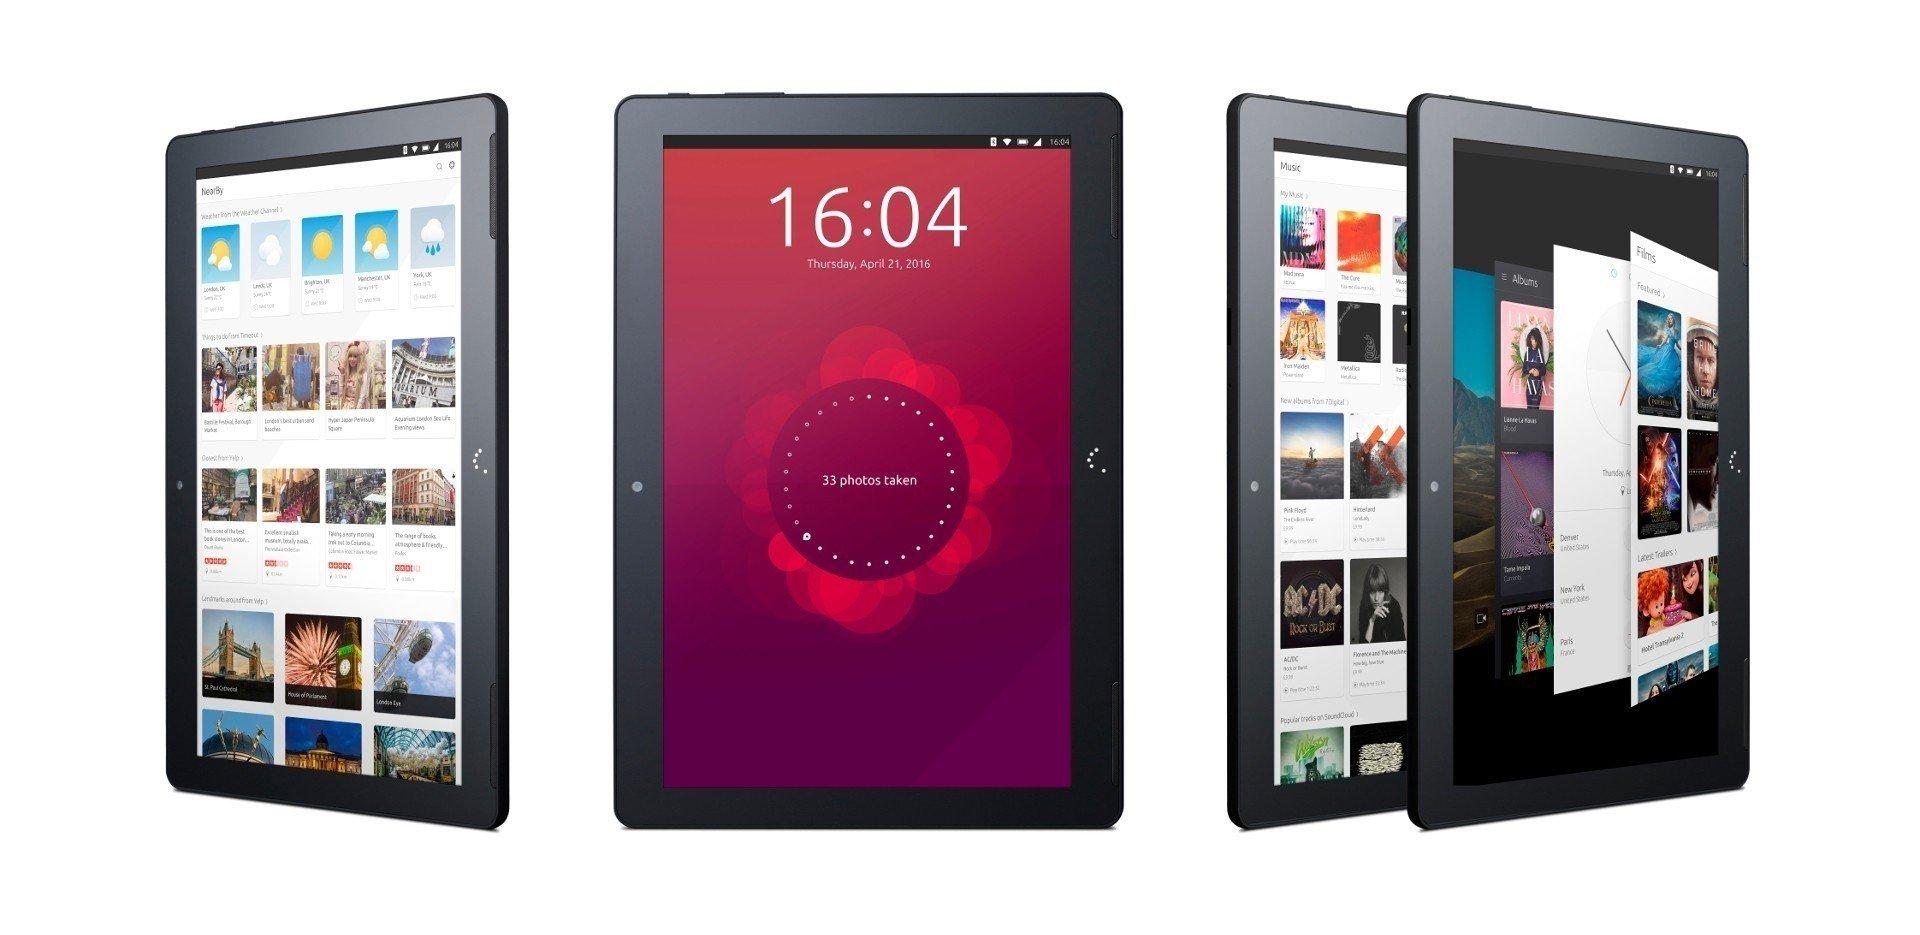 bq-m10 ubuntu touch